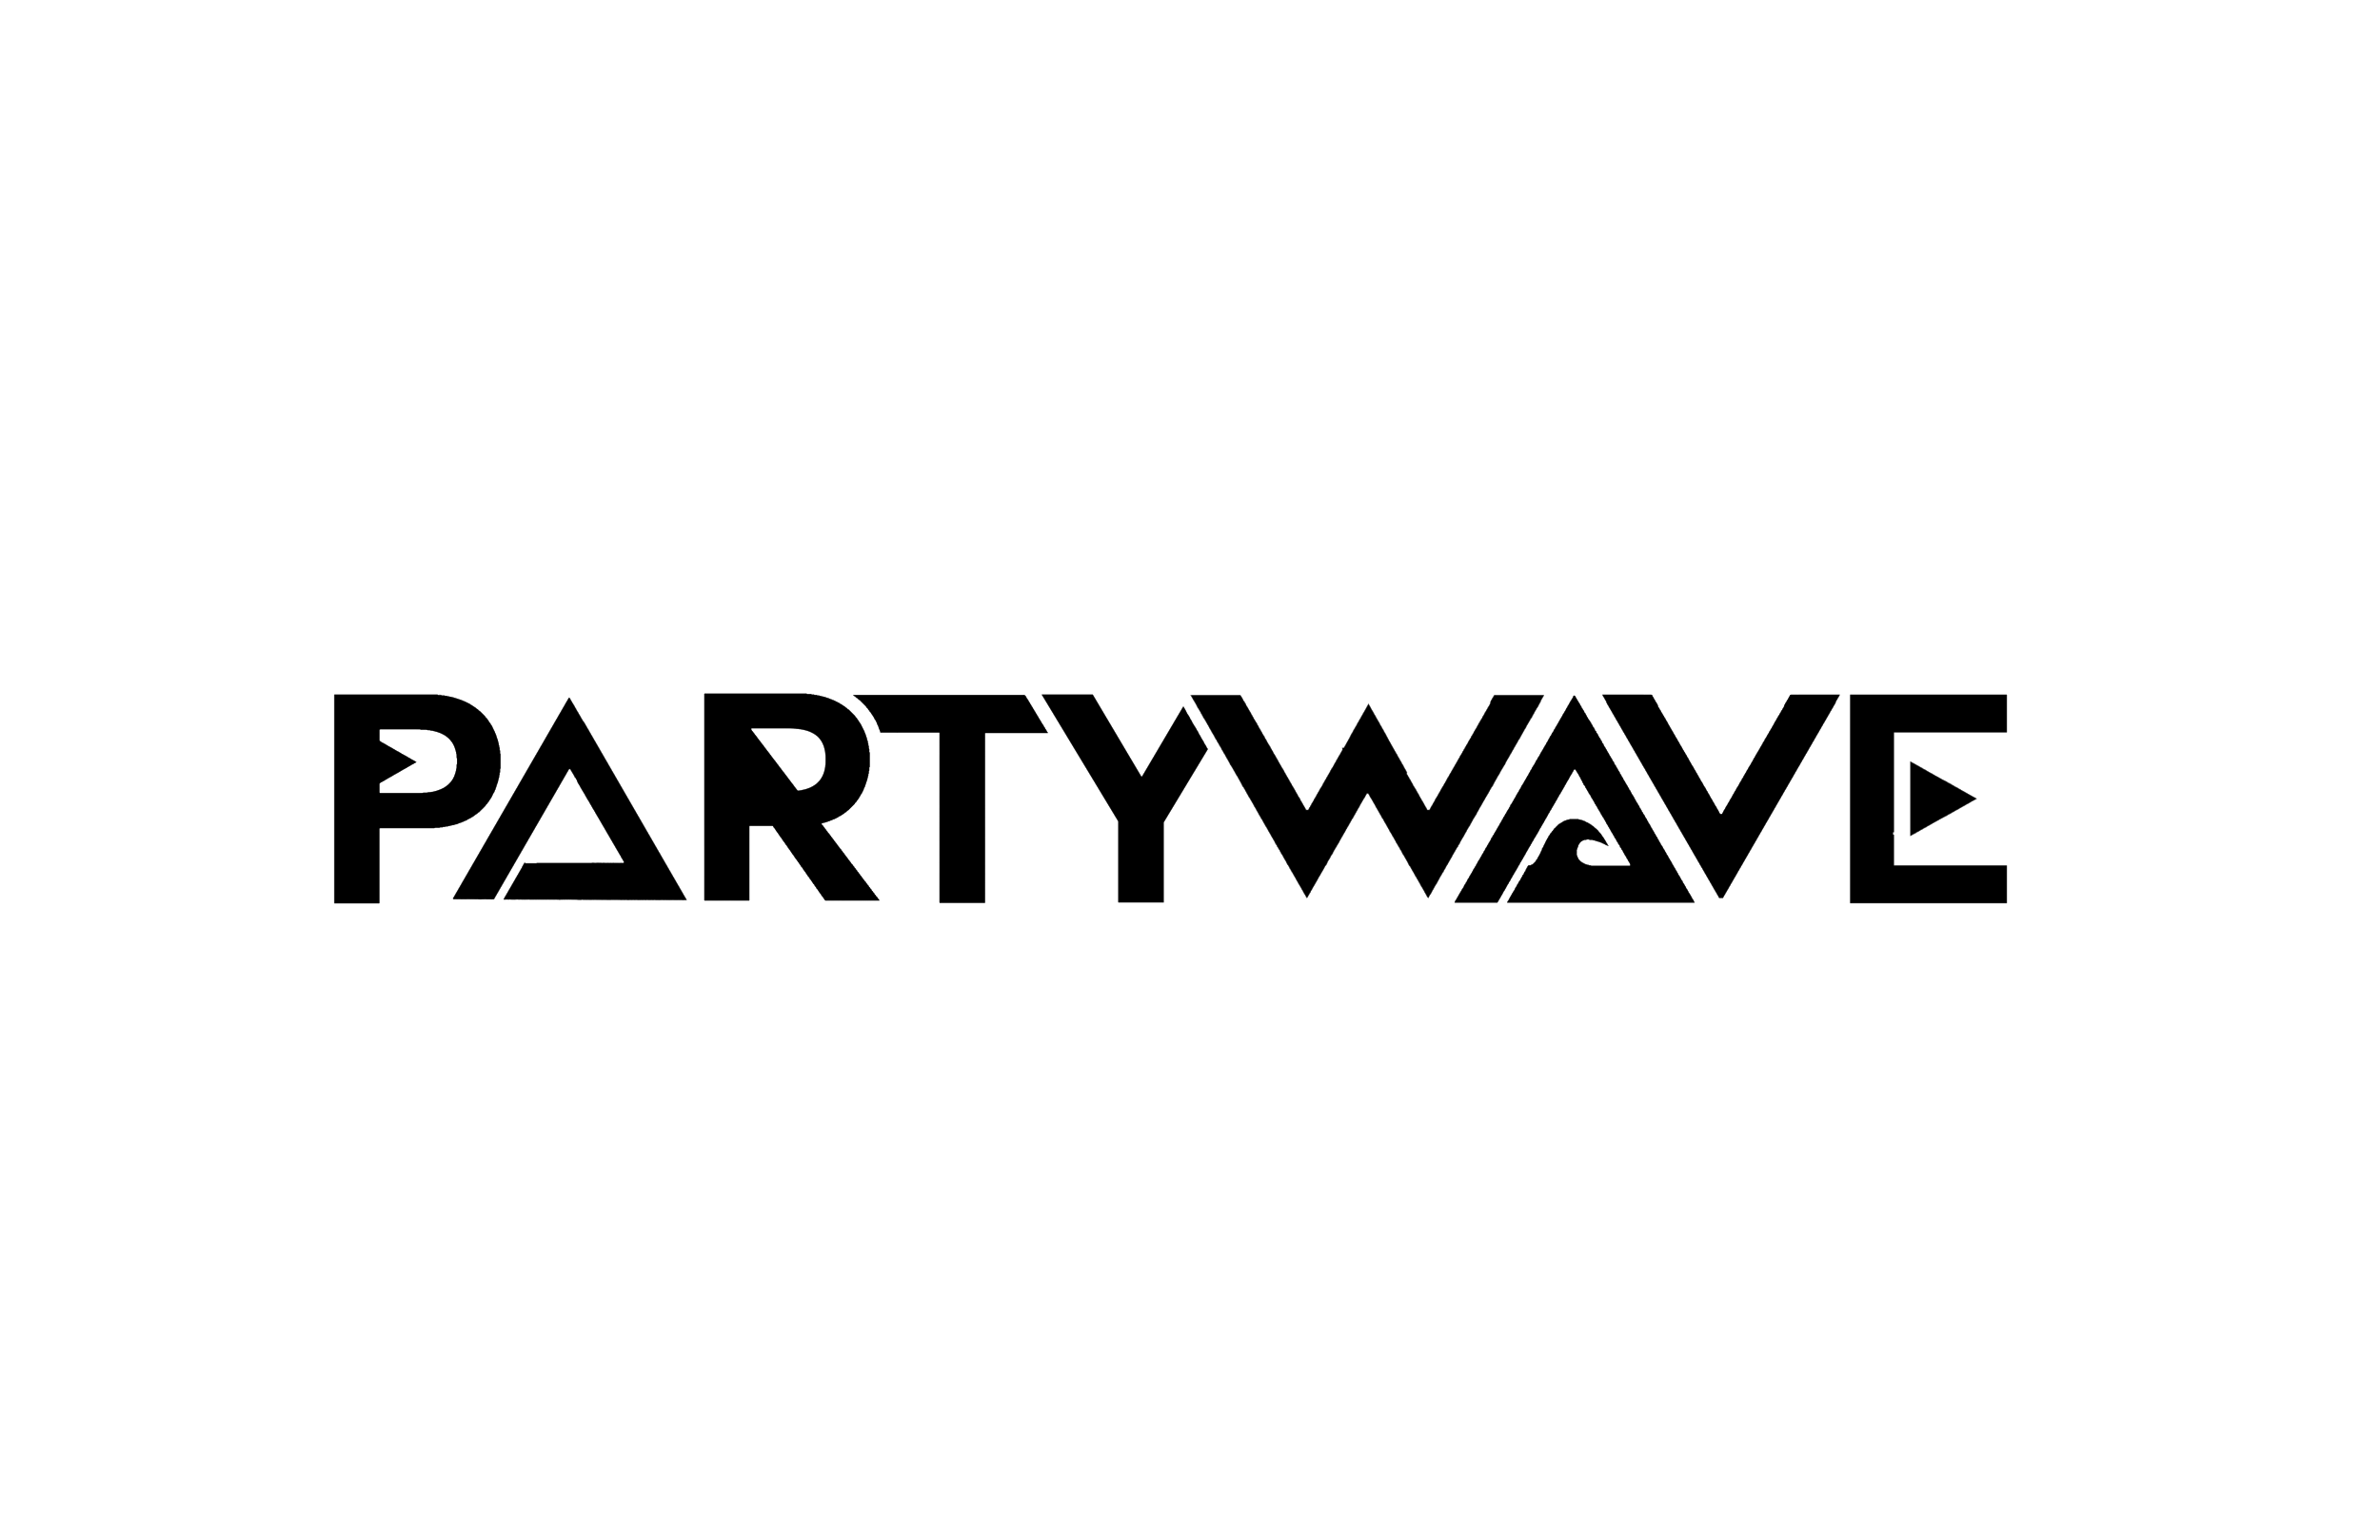 PartyWave Logo 6 (black).png